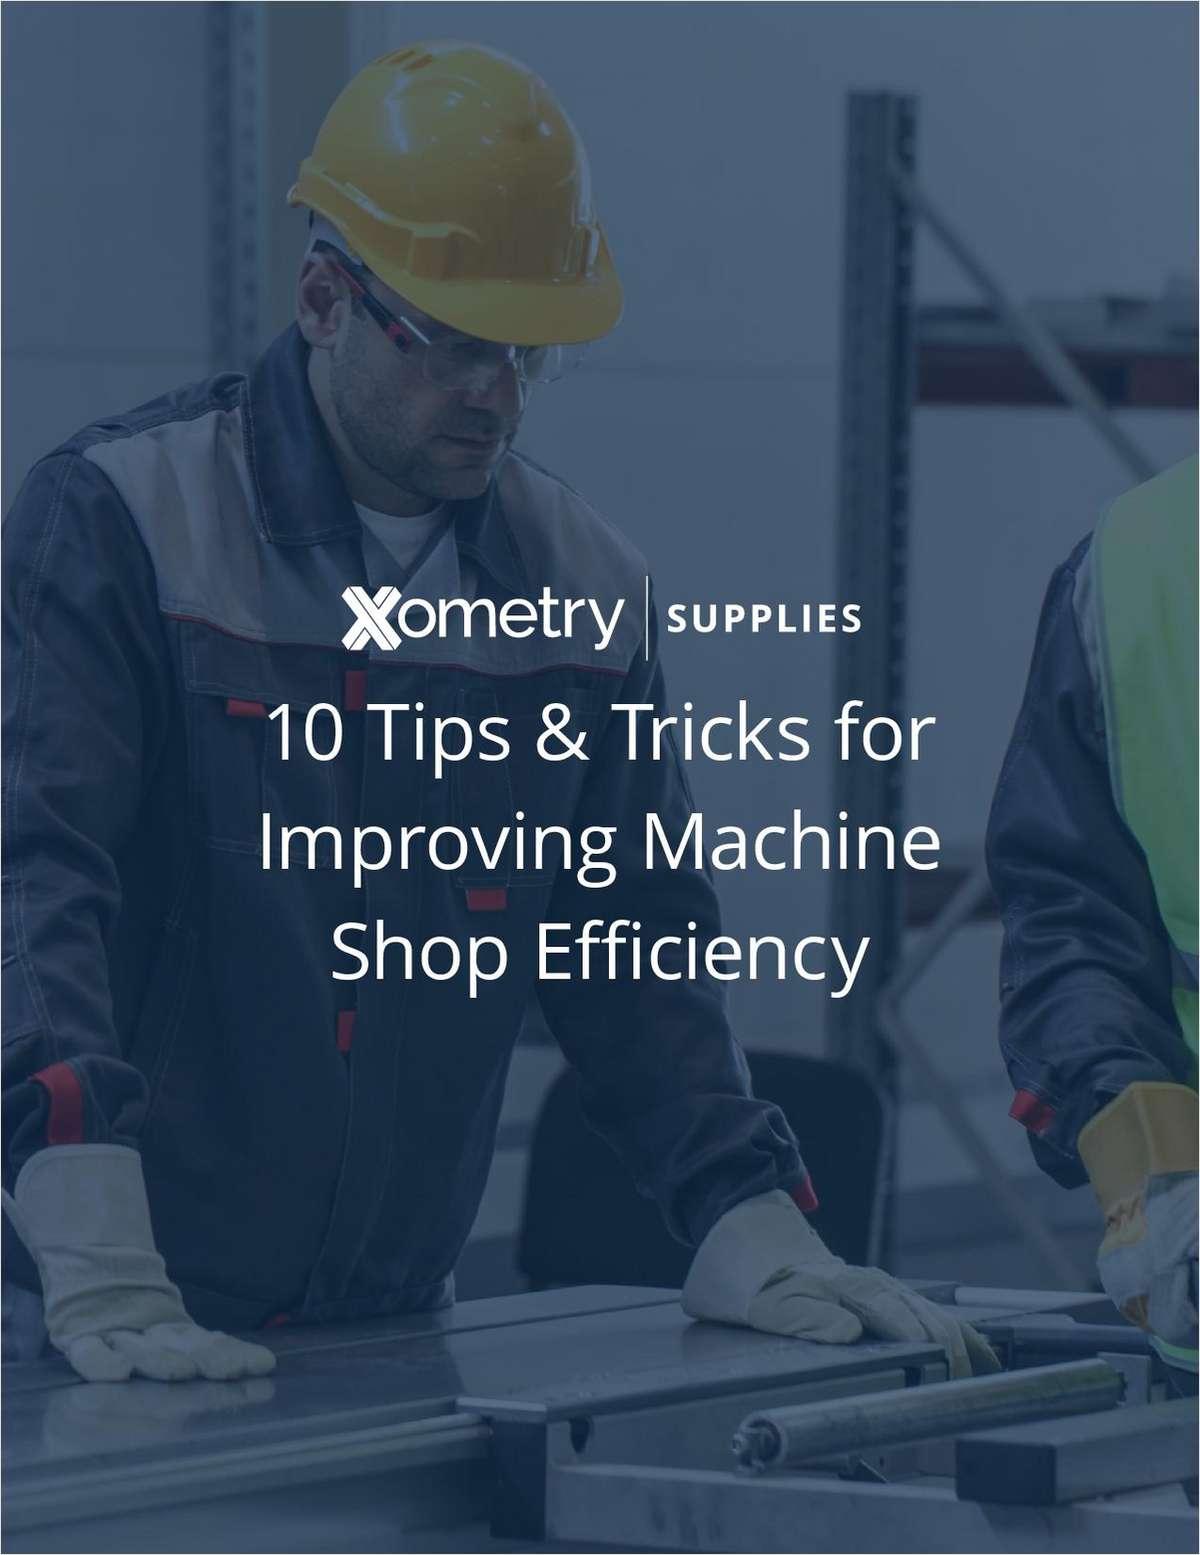 10 Tips & Tricks for Improving Machine Shop Efficiency